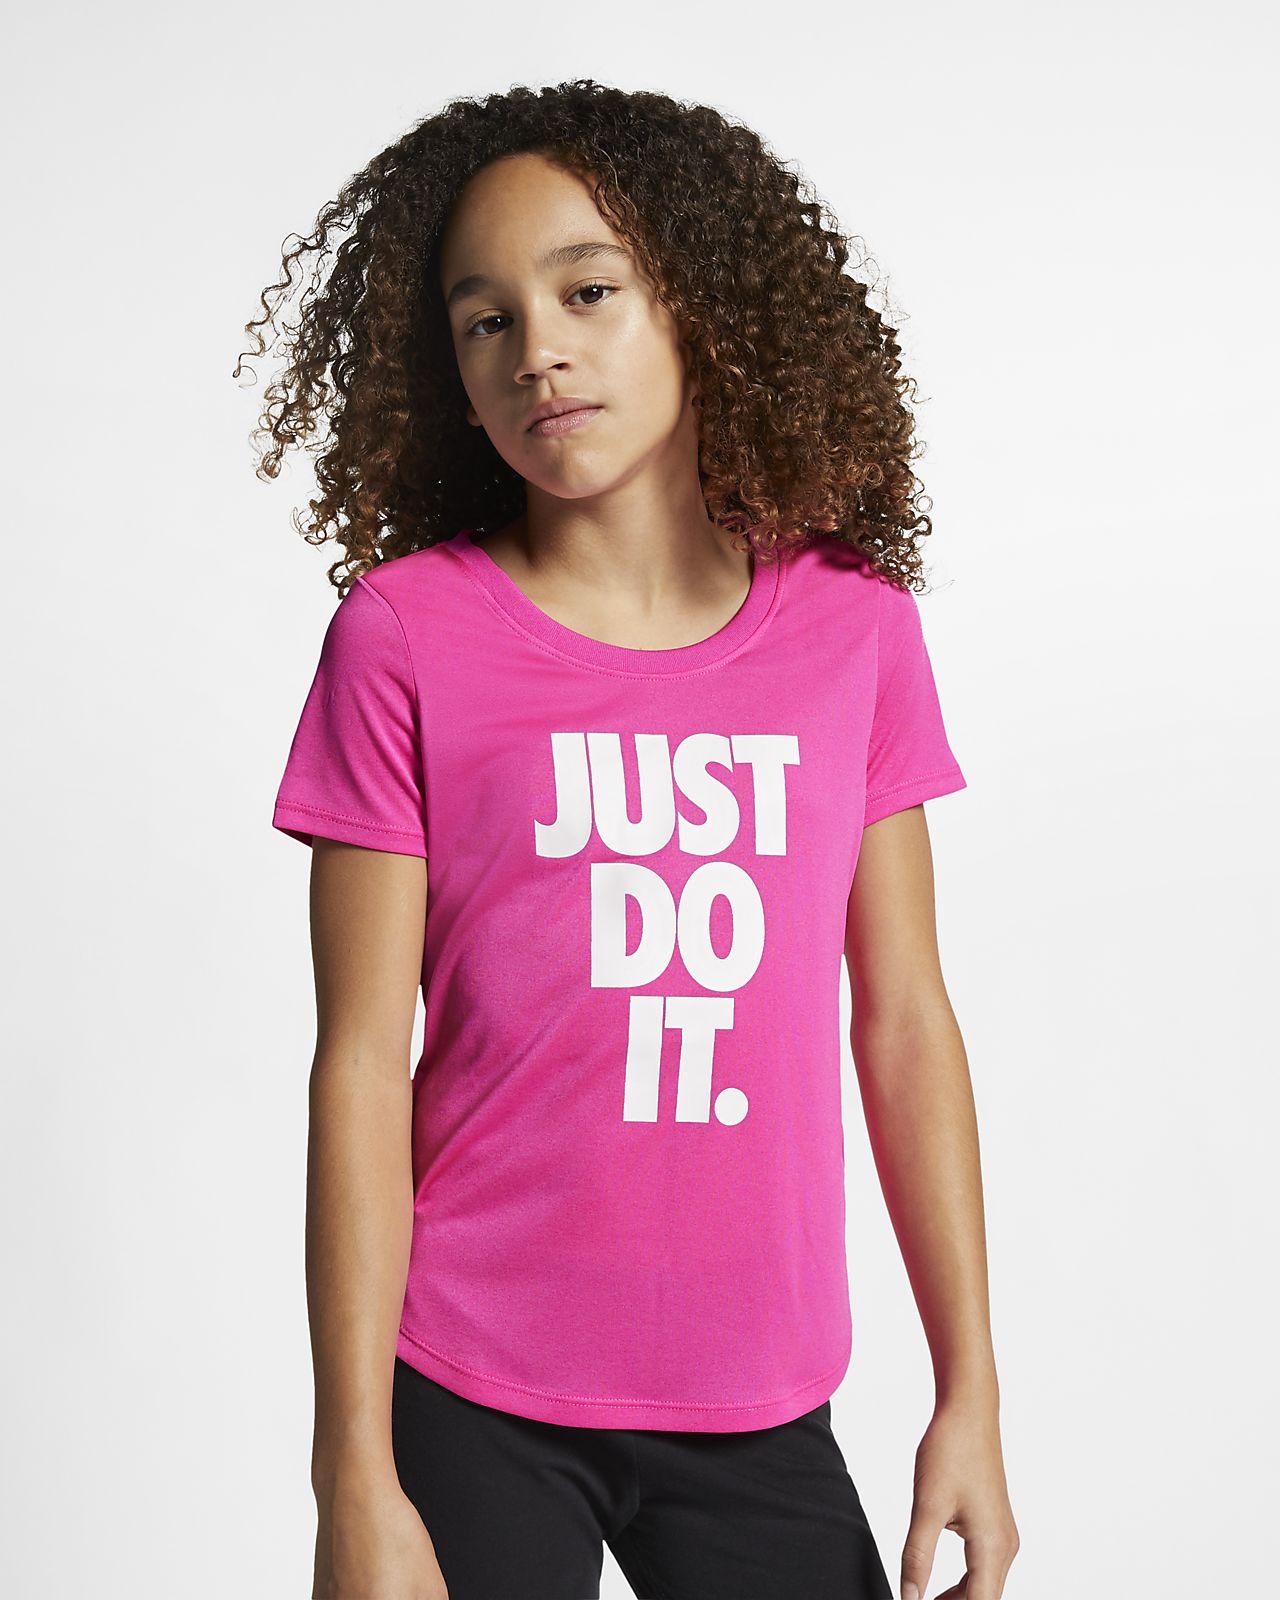 Nike Dri-FIT Older Kids' (Girls') Training T-Shirt